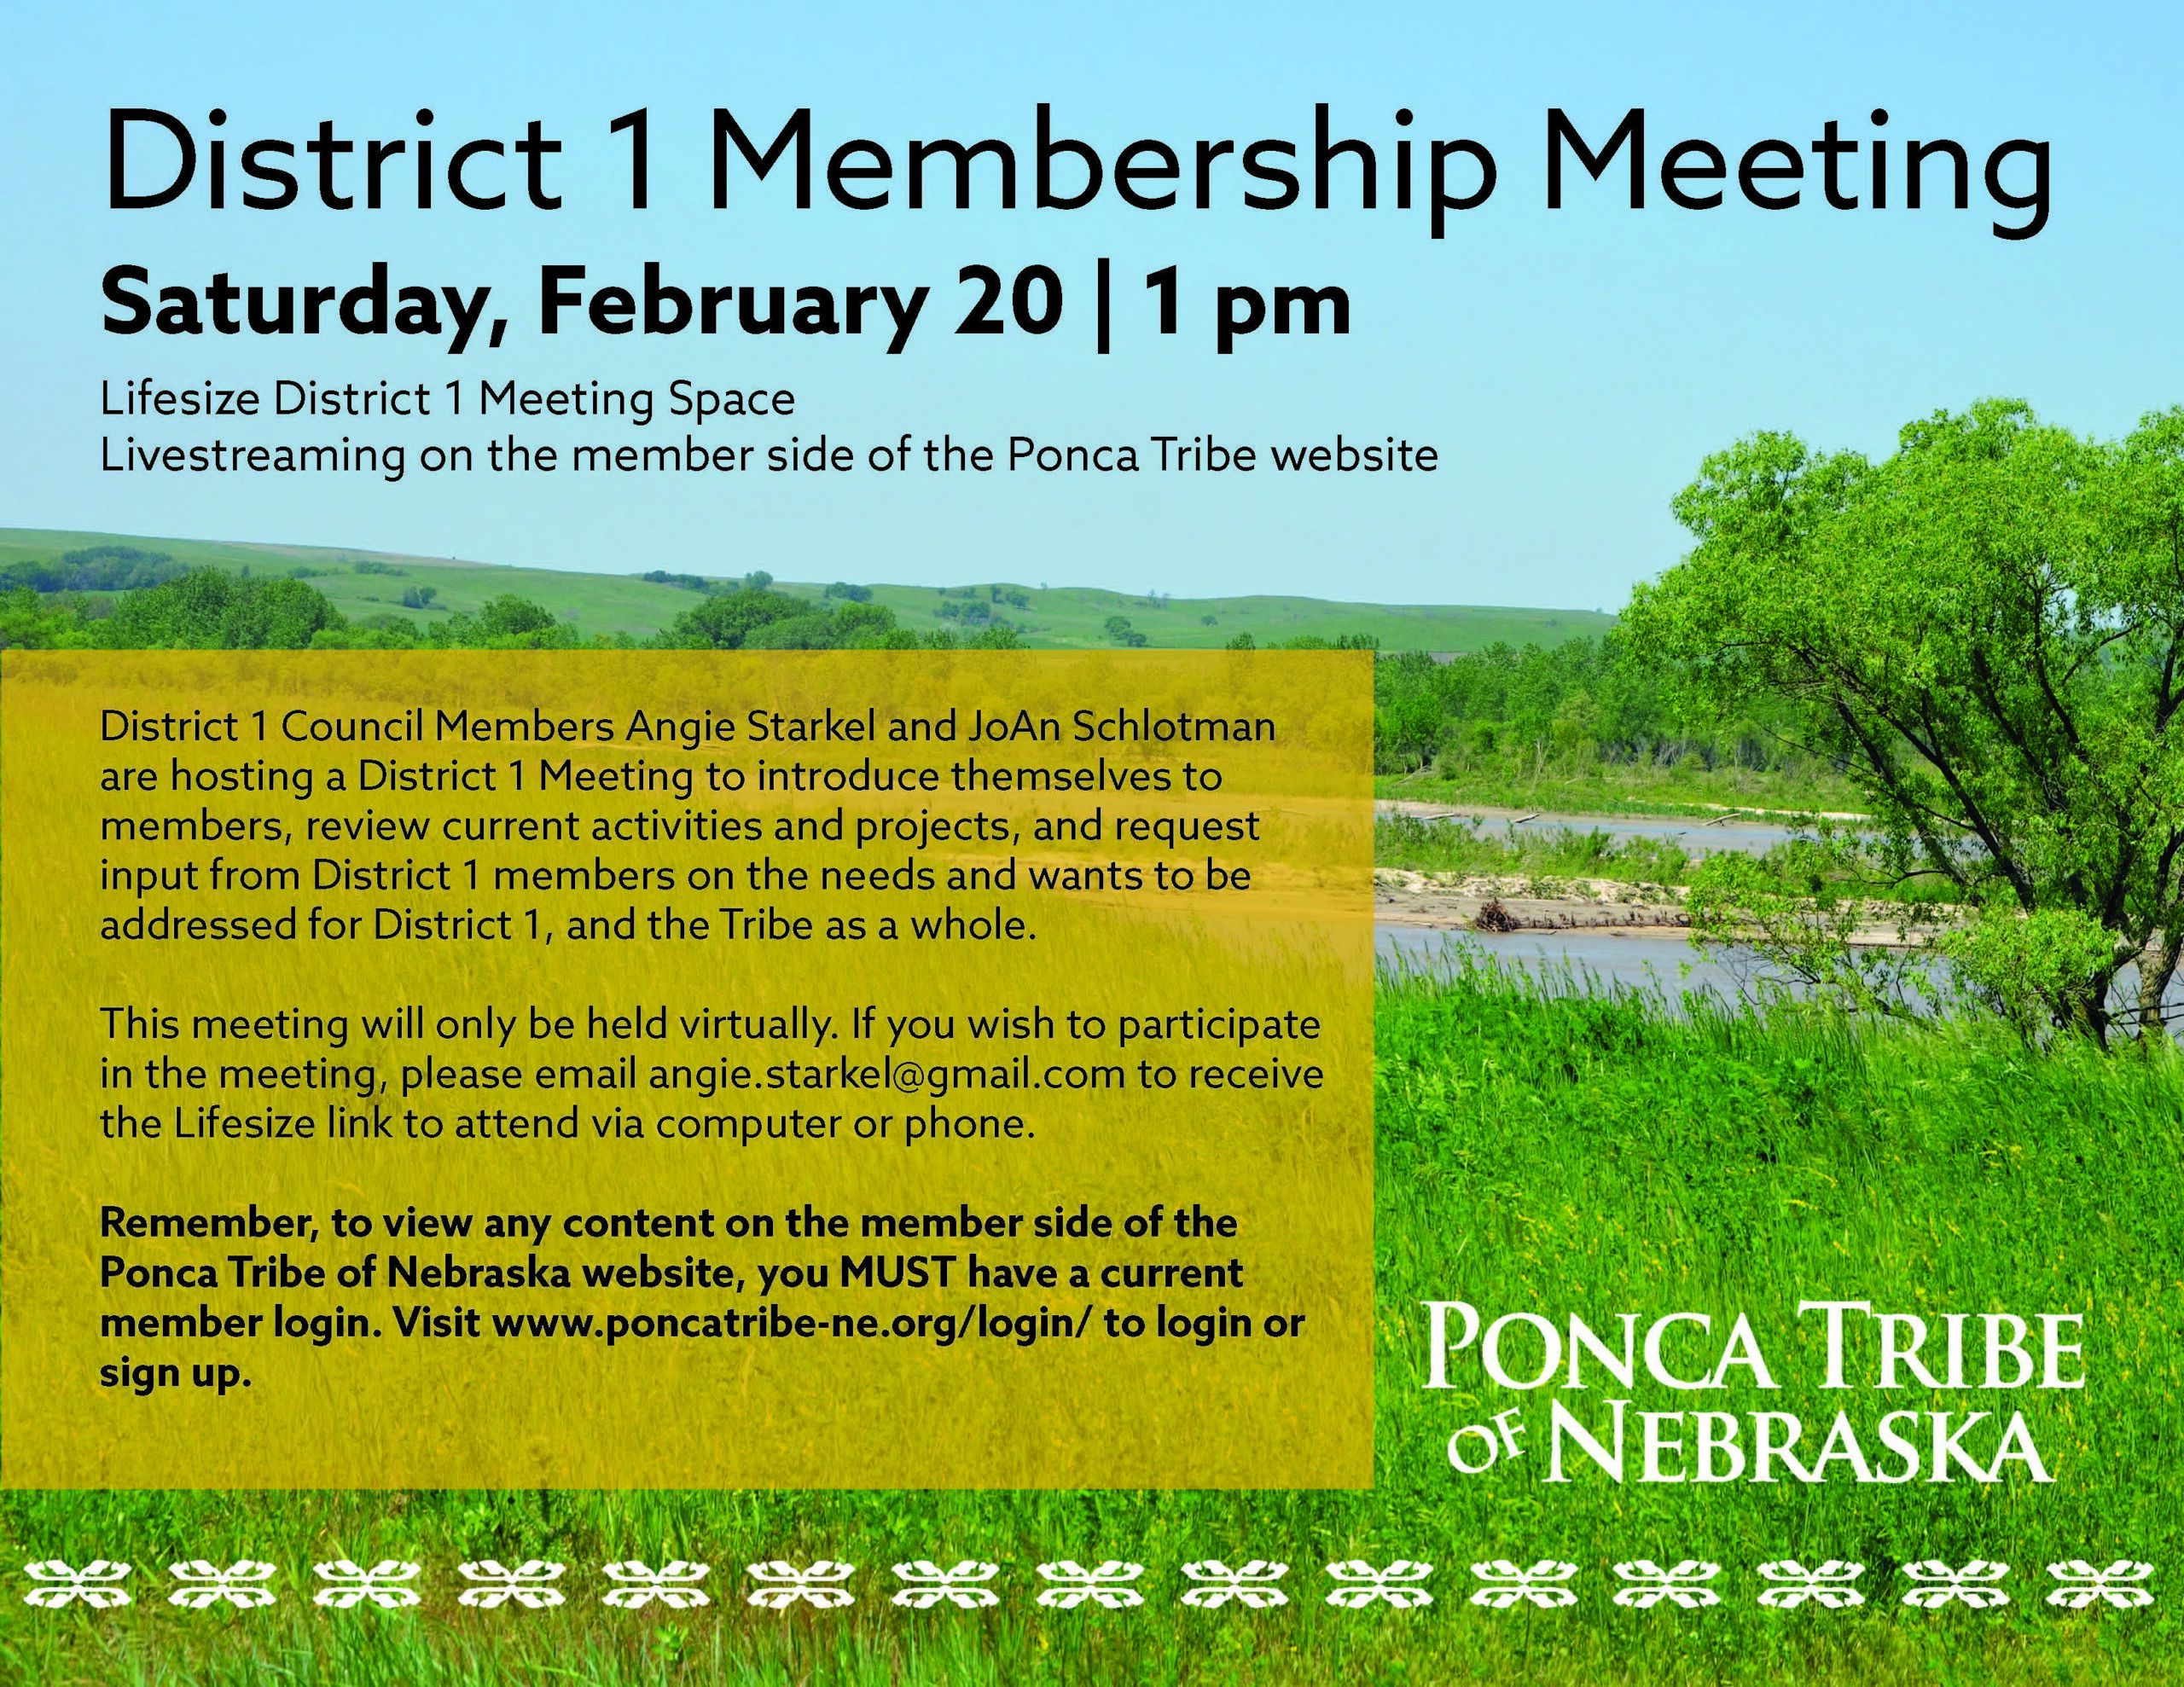 District 1 Virtual Membership Meeting